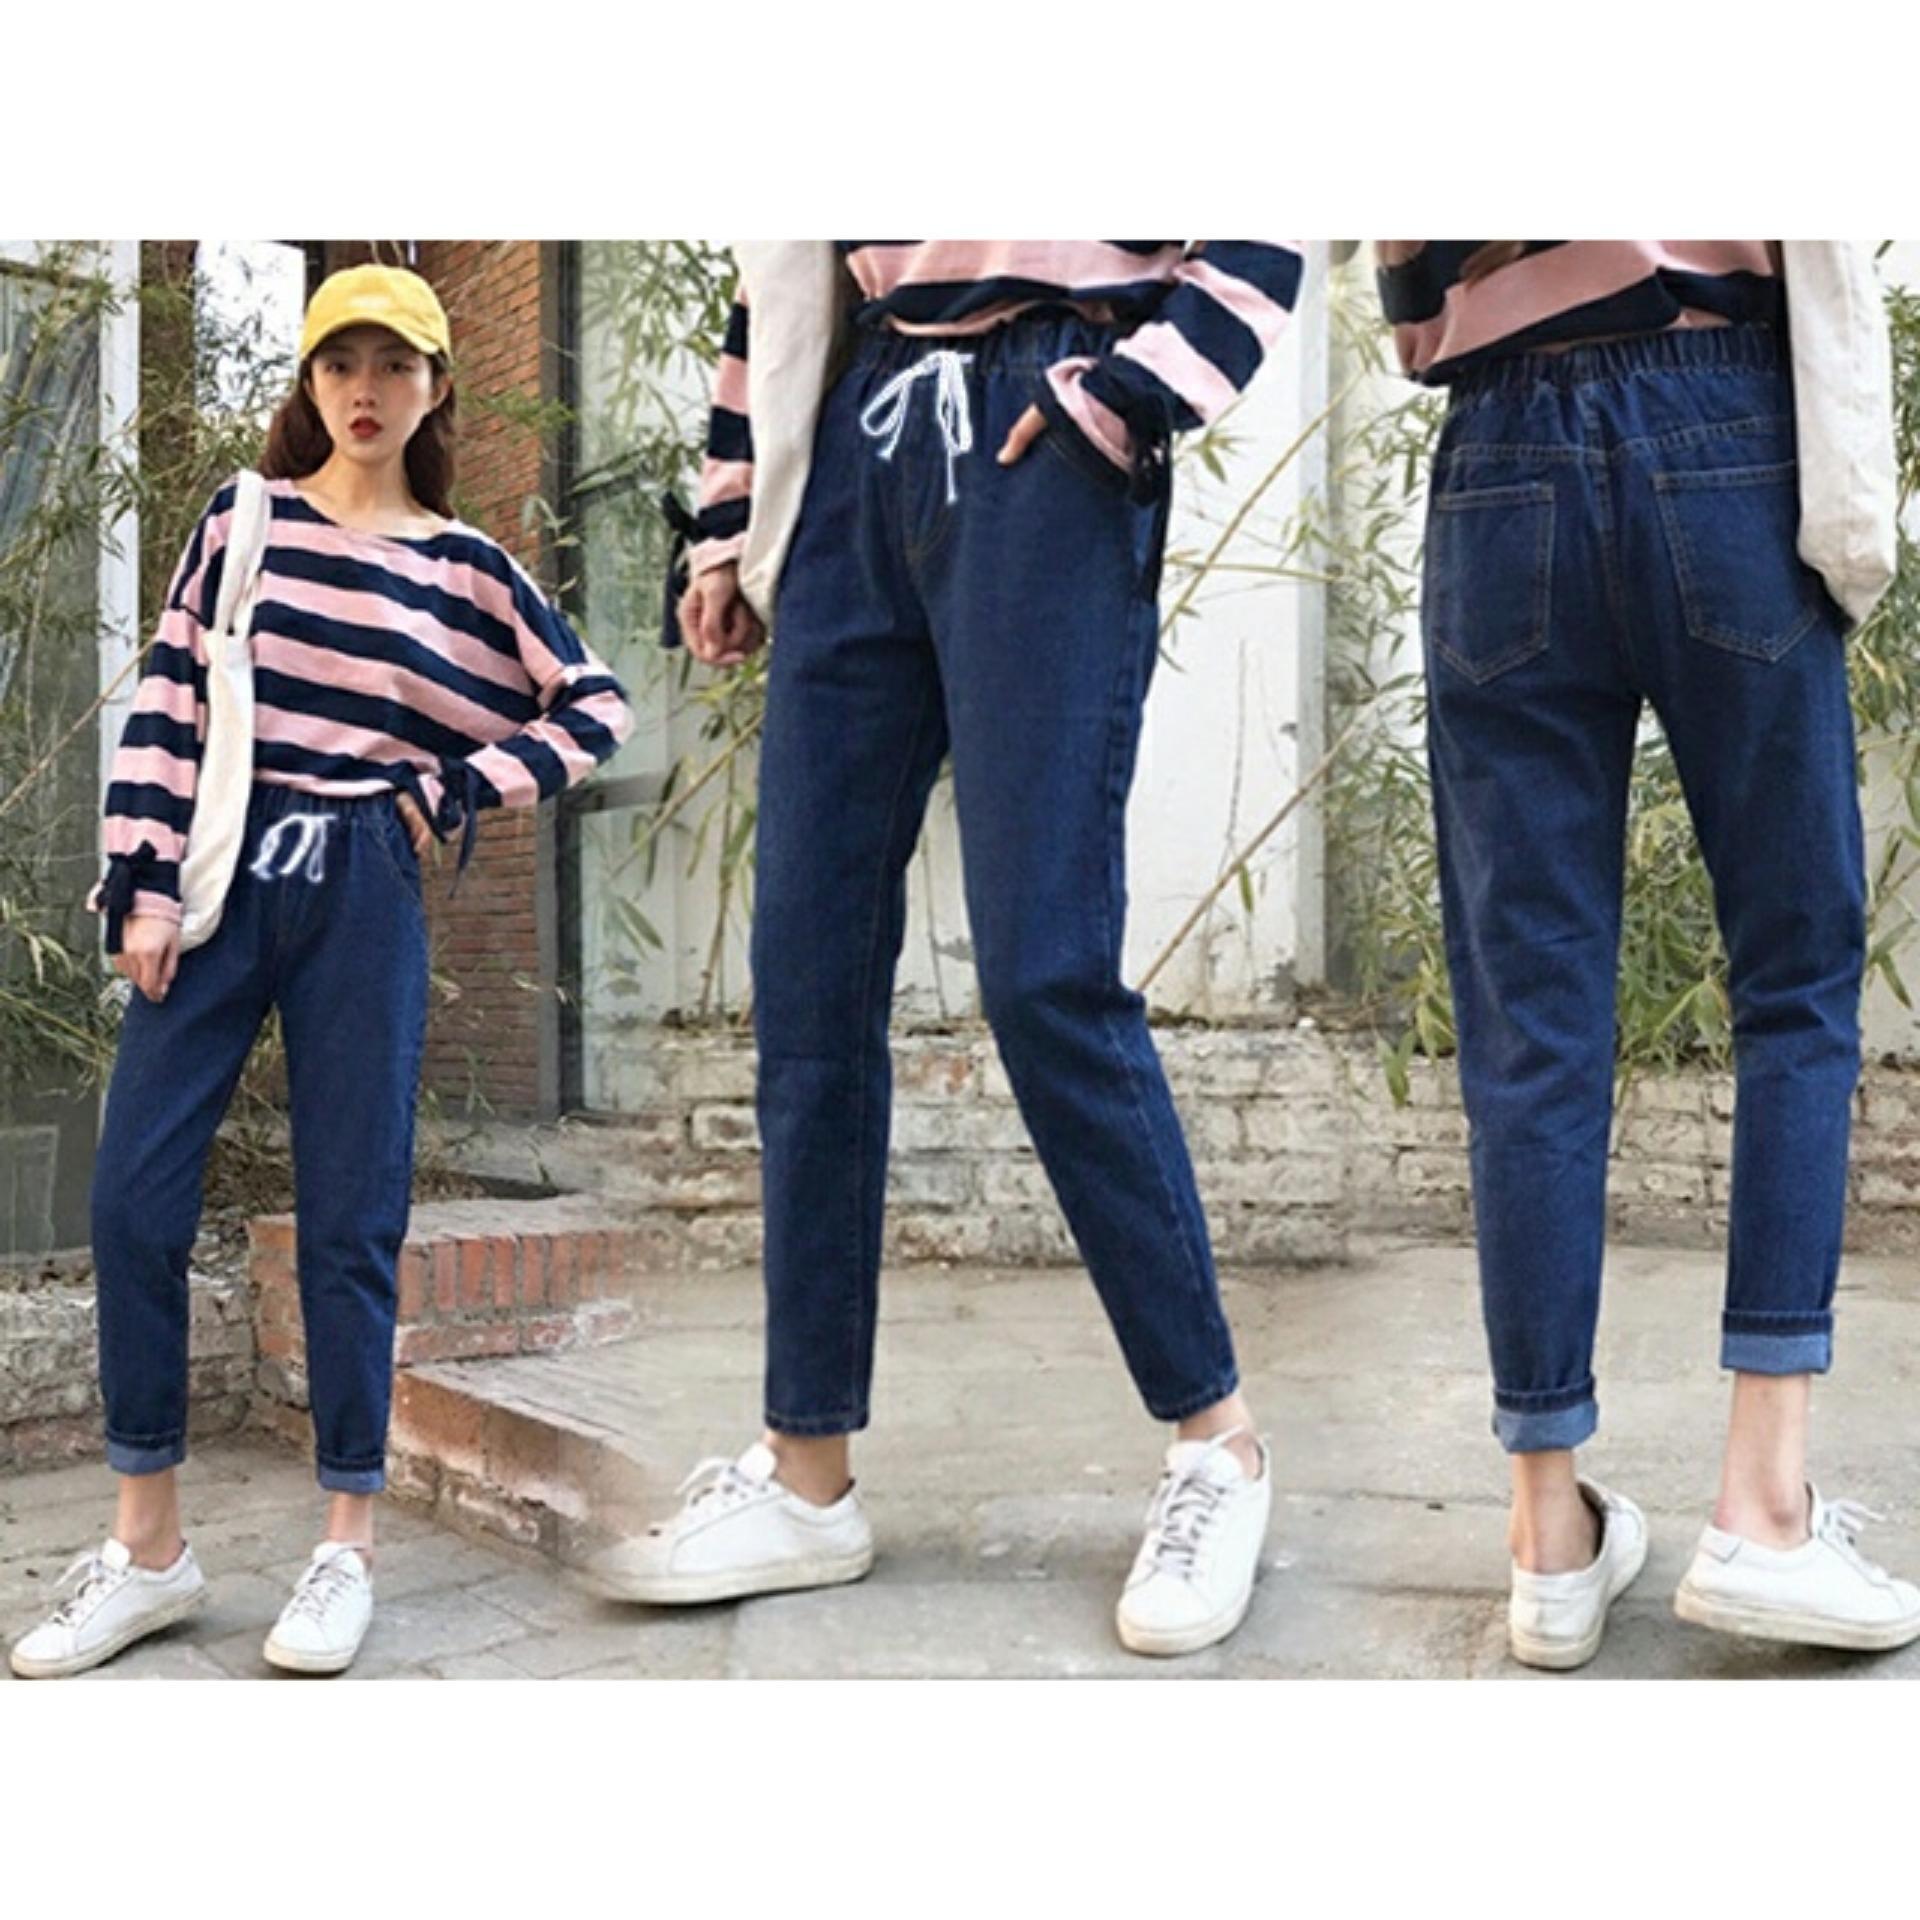 9 Shop Celana Jeans Denim Boyfriend Wanita LIDIA (Kualitas Premium ) / Celana Panjang /